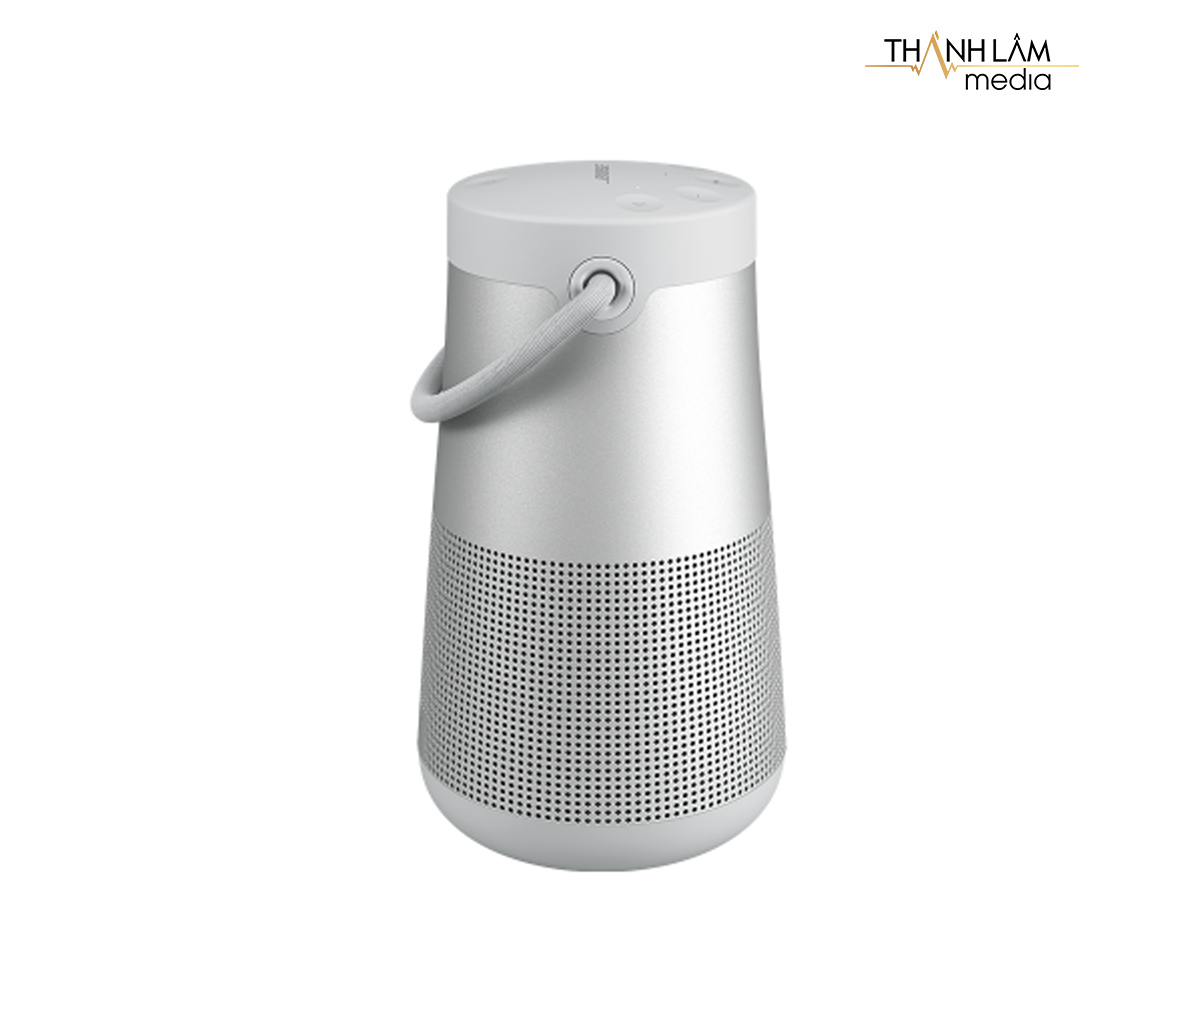 Loa-Bose-SoundLink-Revolve-Plus-Trang-5